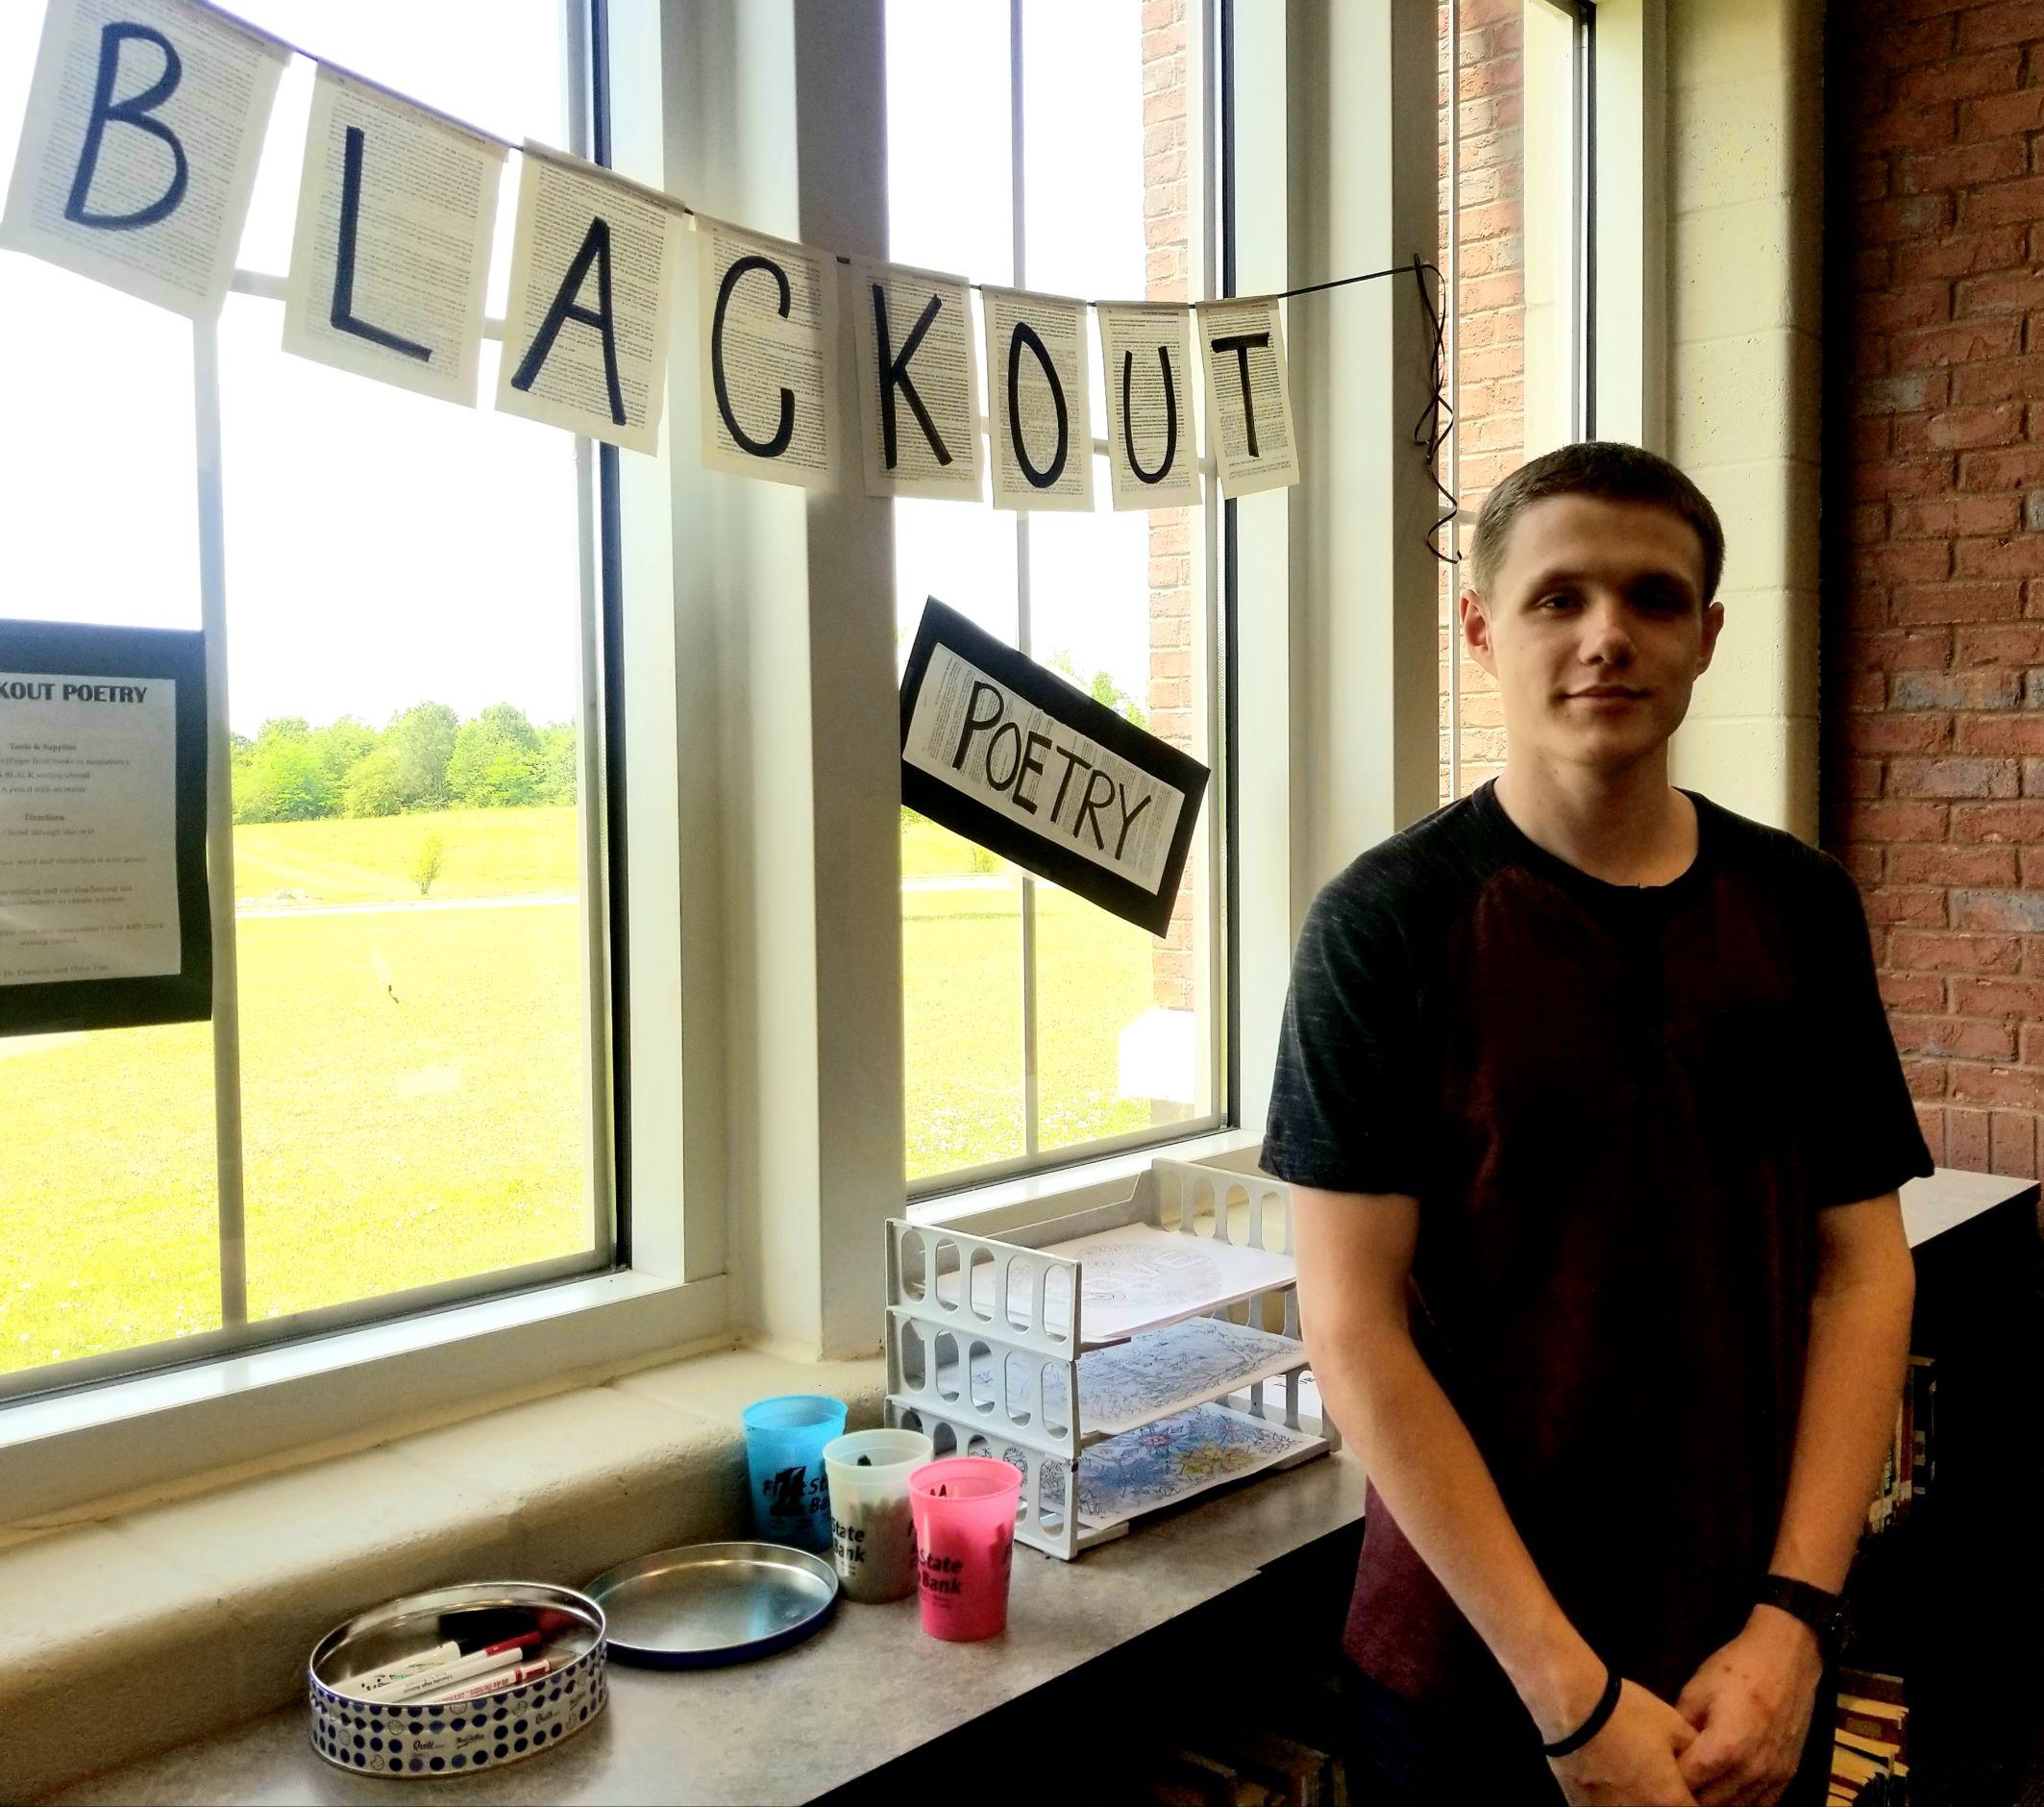 Blackout Poetry Winners